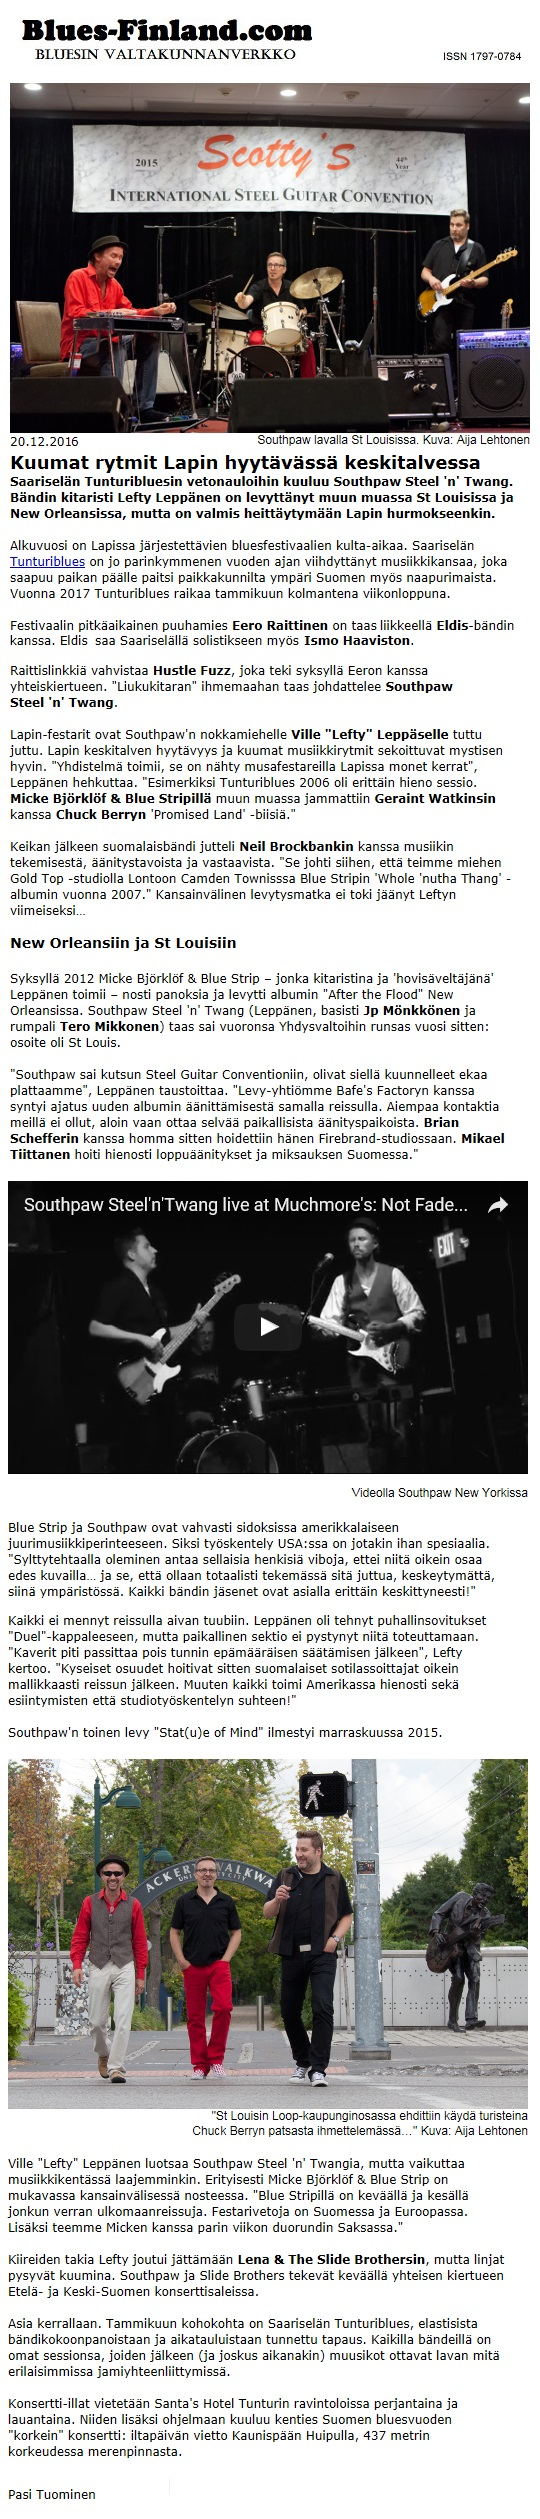 Blues-Finland.com 20.12.2016